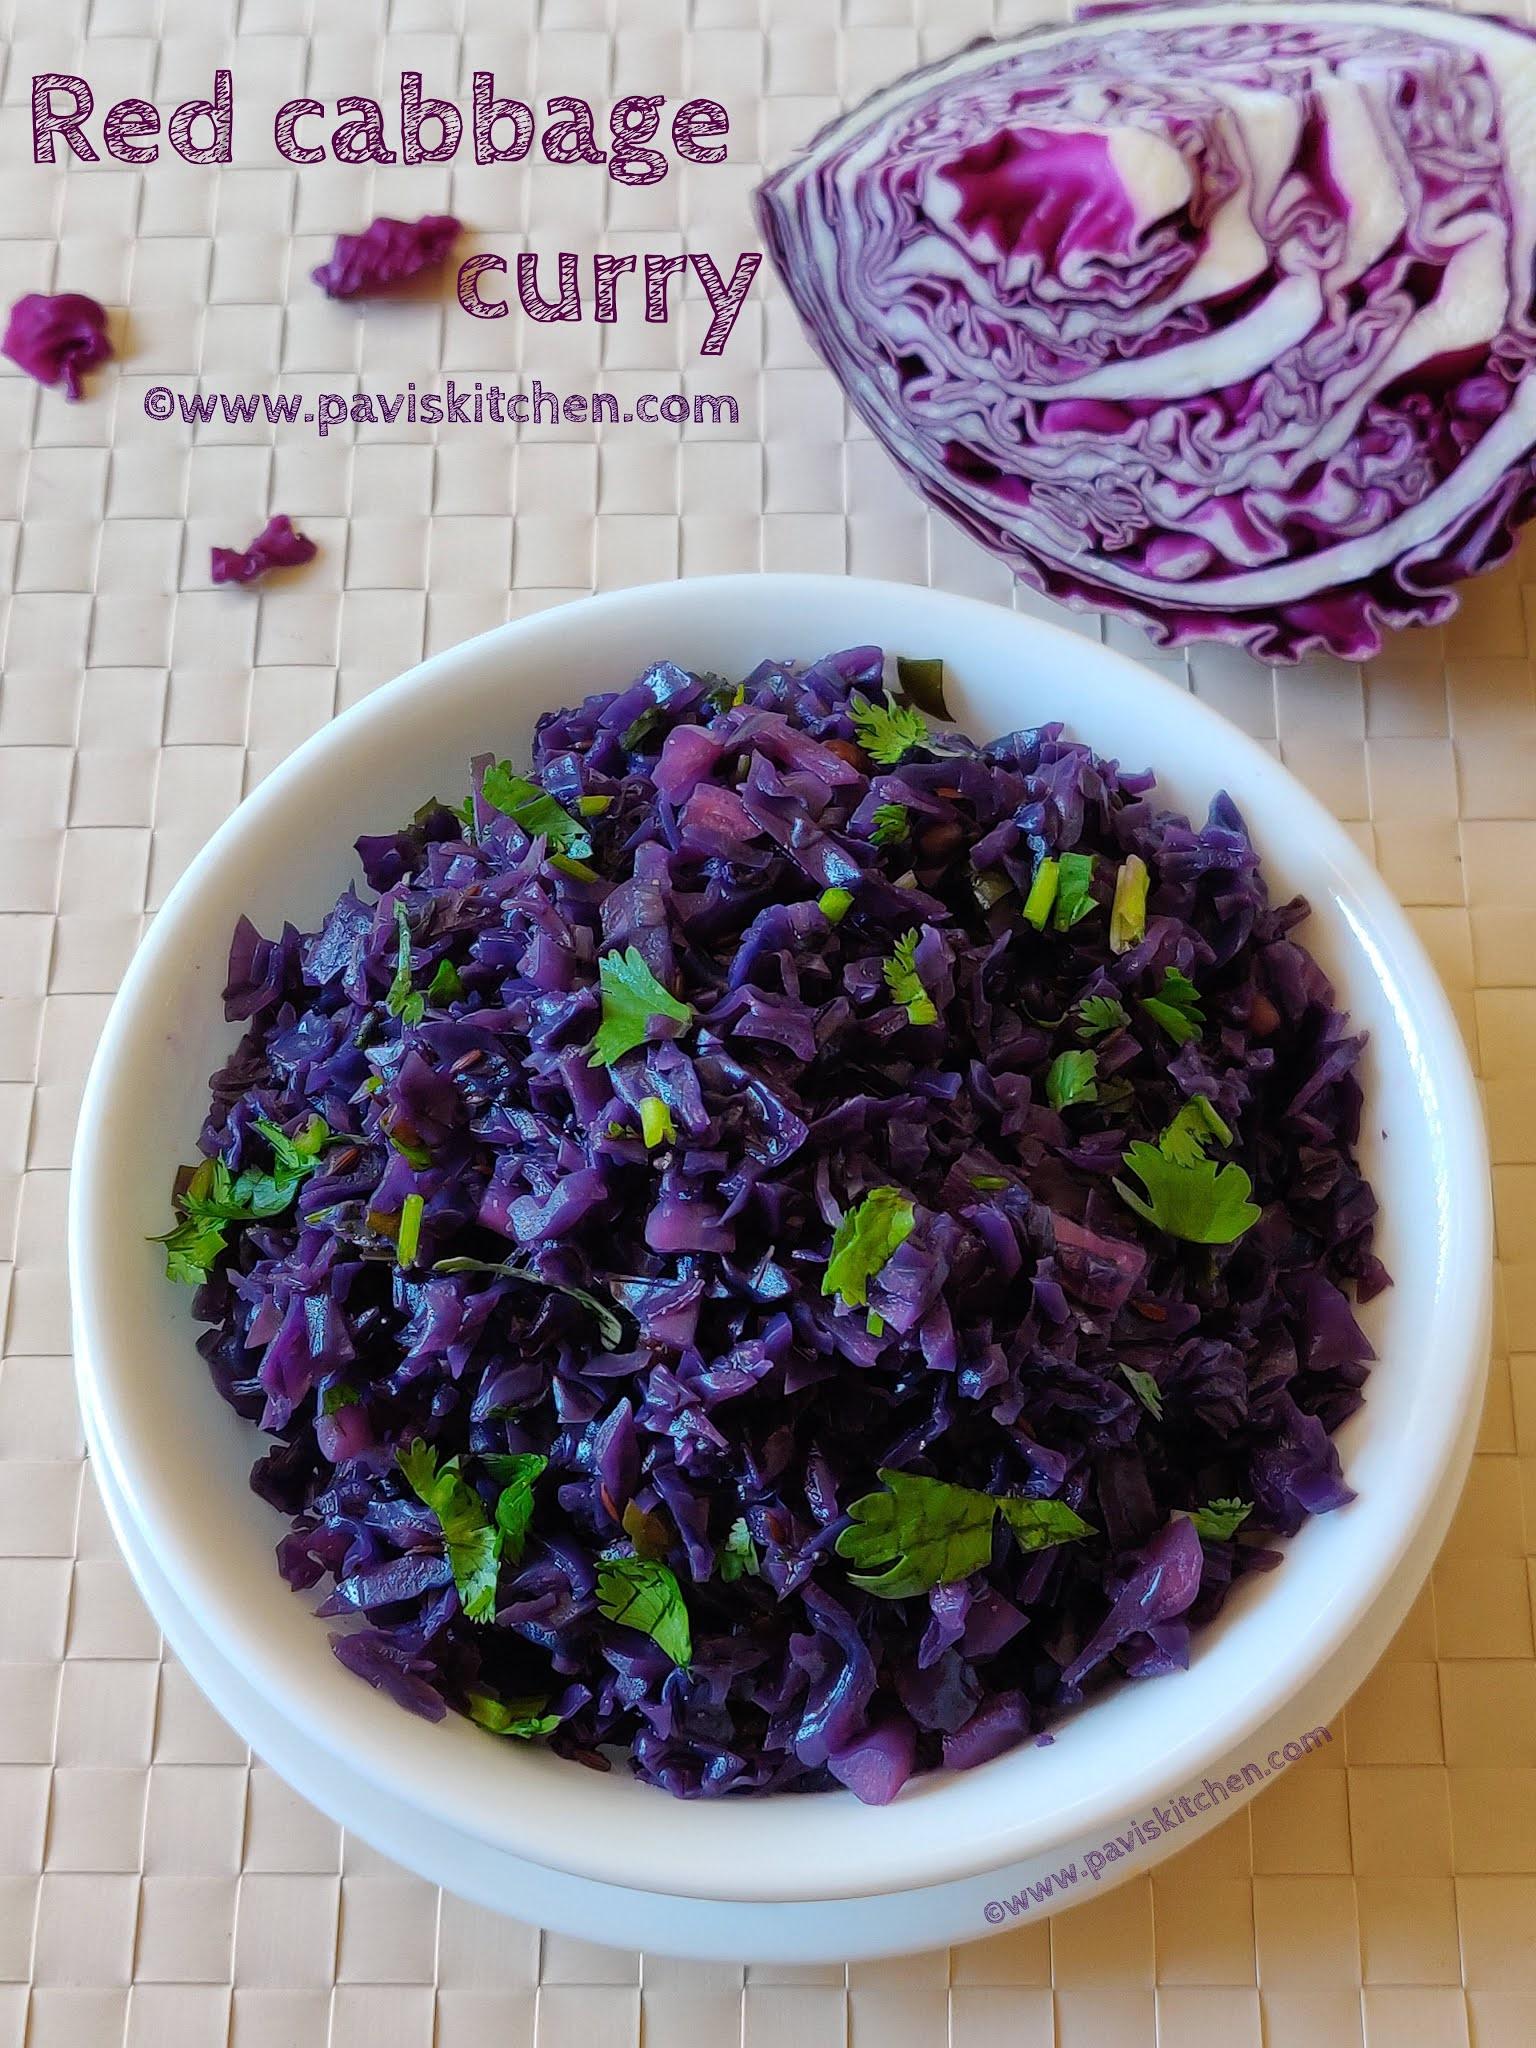 Red cabbage curry recipe | Indian red cabbage poriyal | purple cabbage poriyal recipe